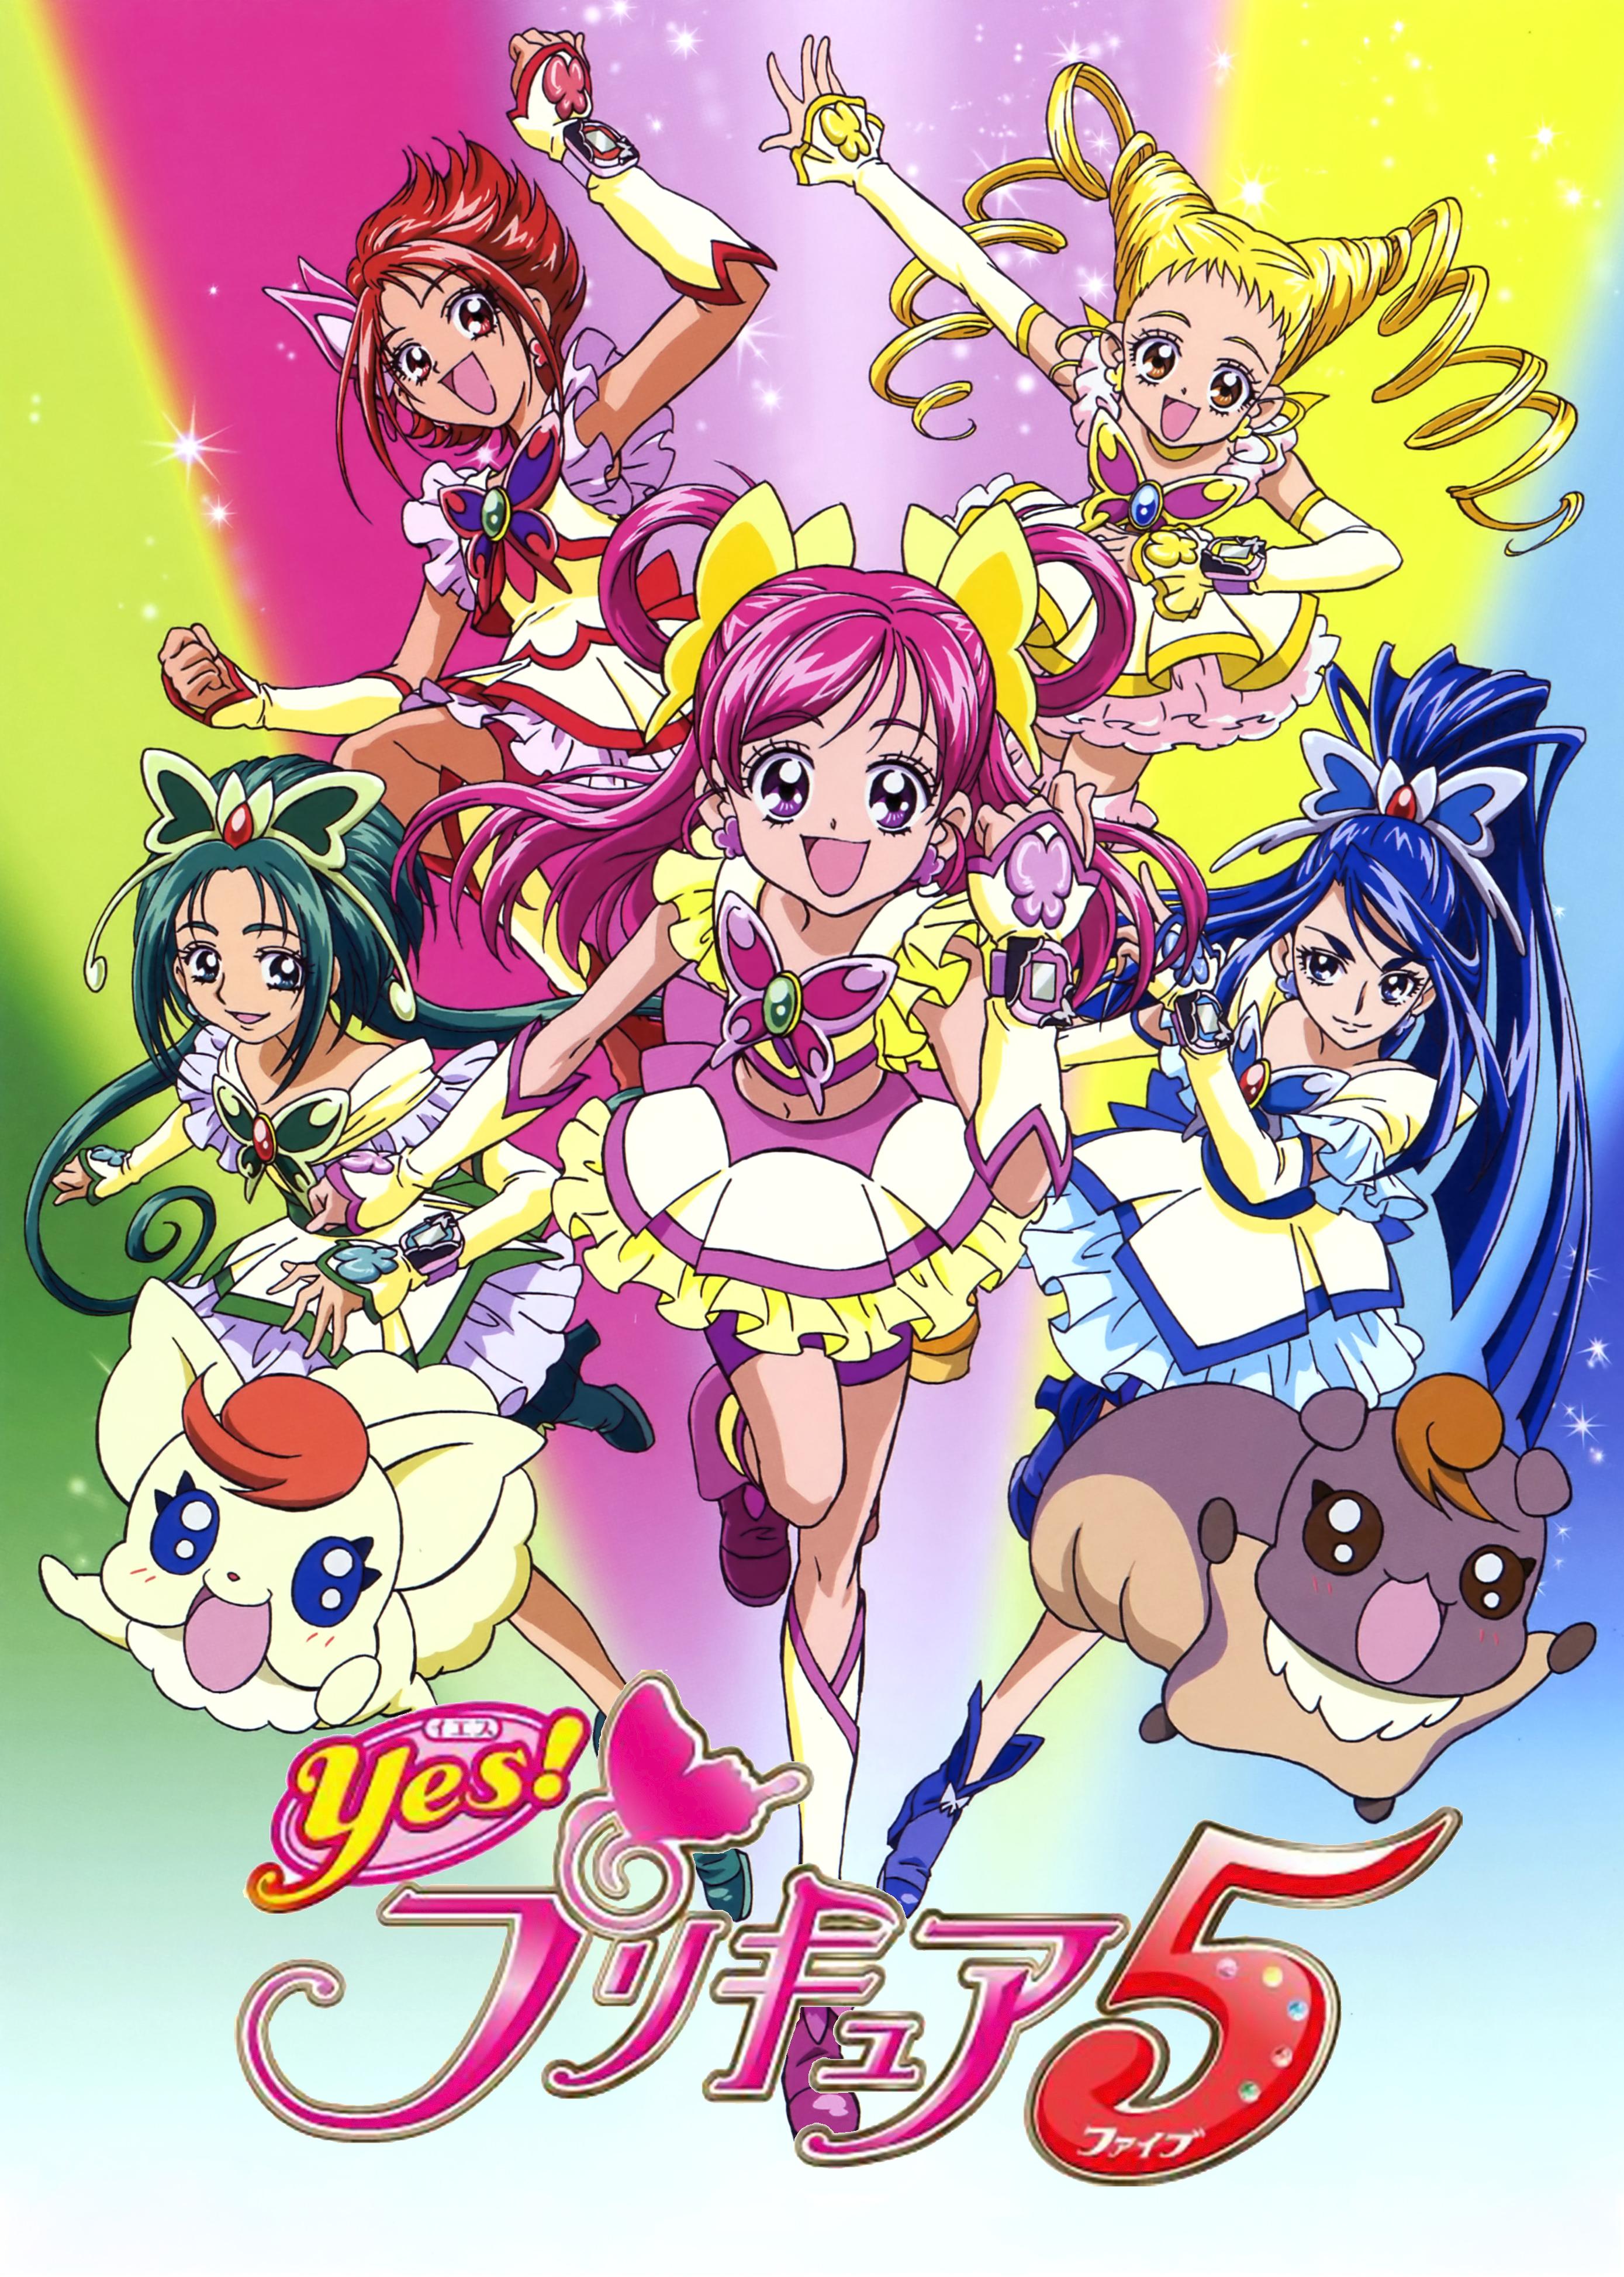 Episodios de Yes! Pretty Cure 5